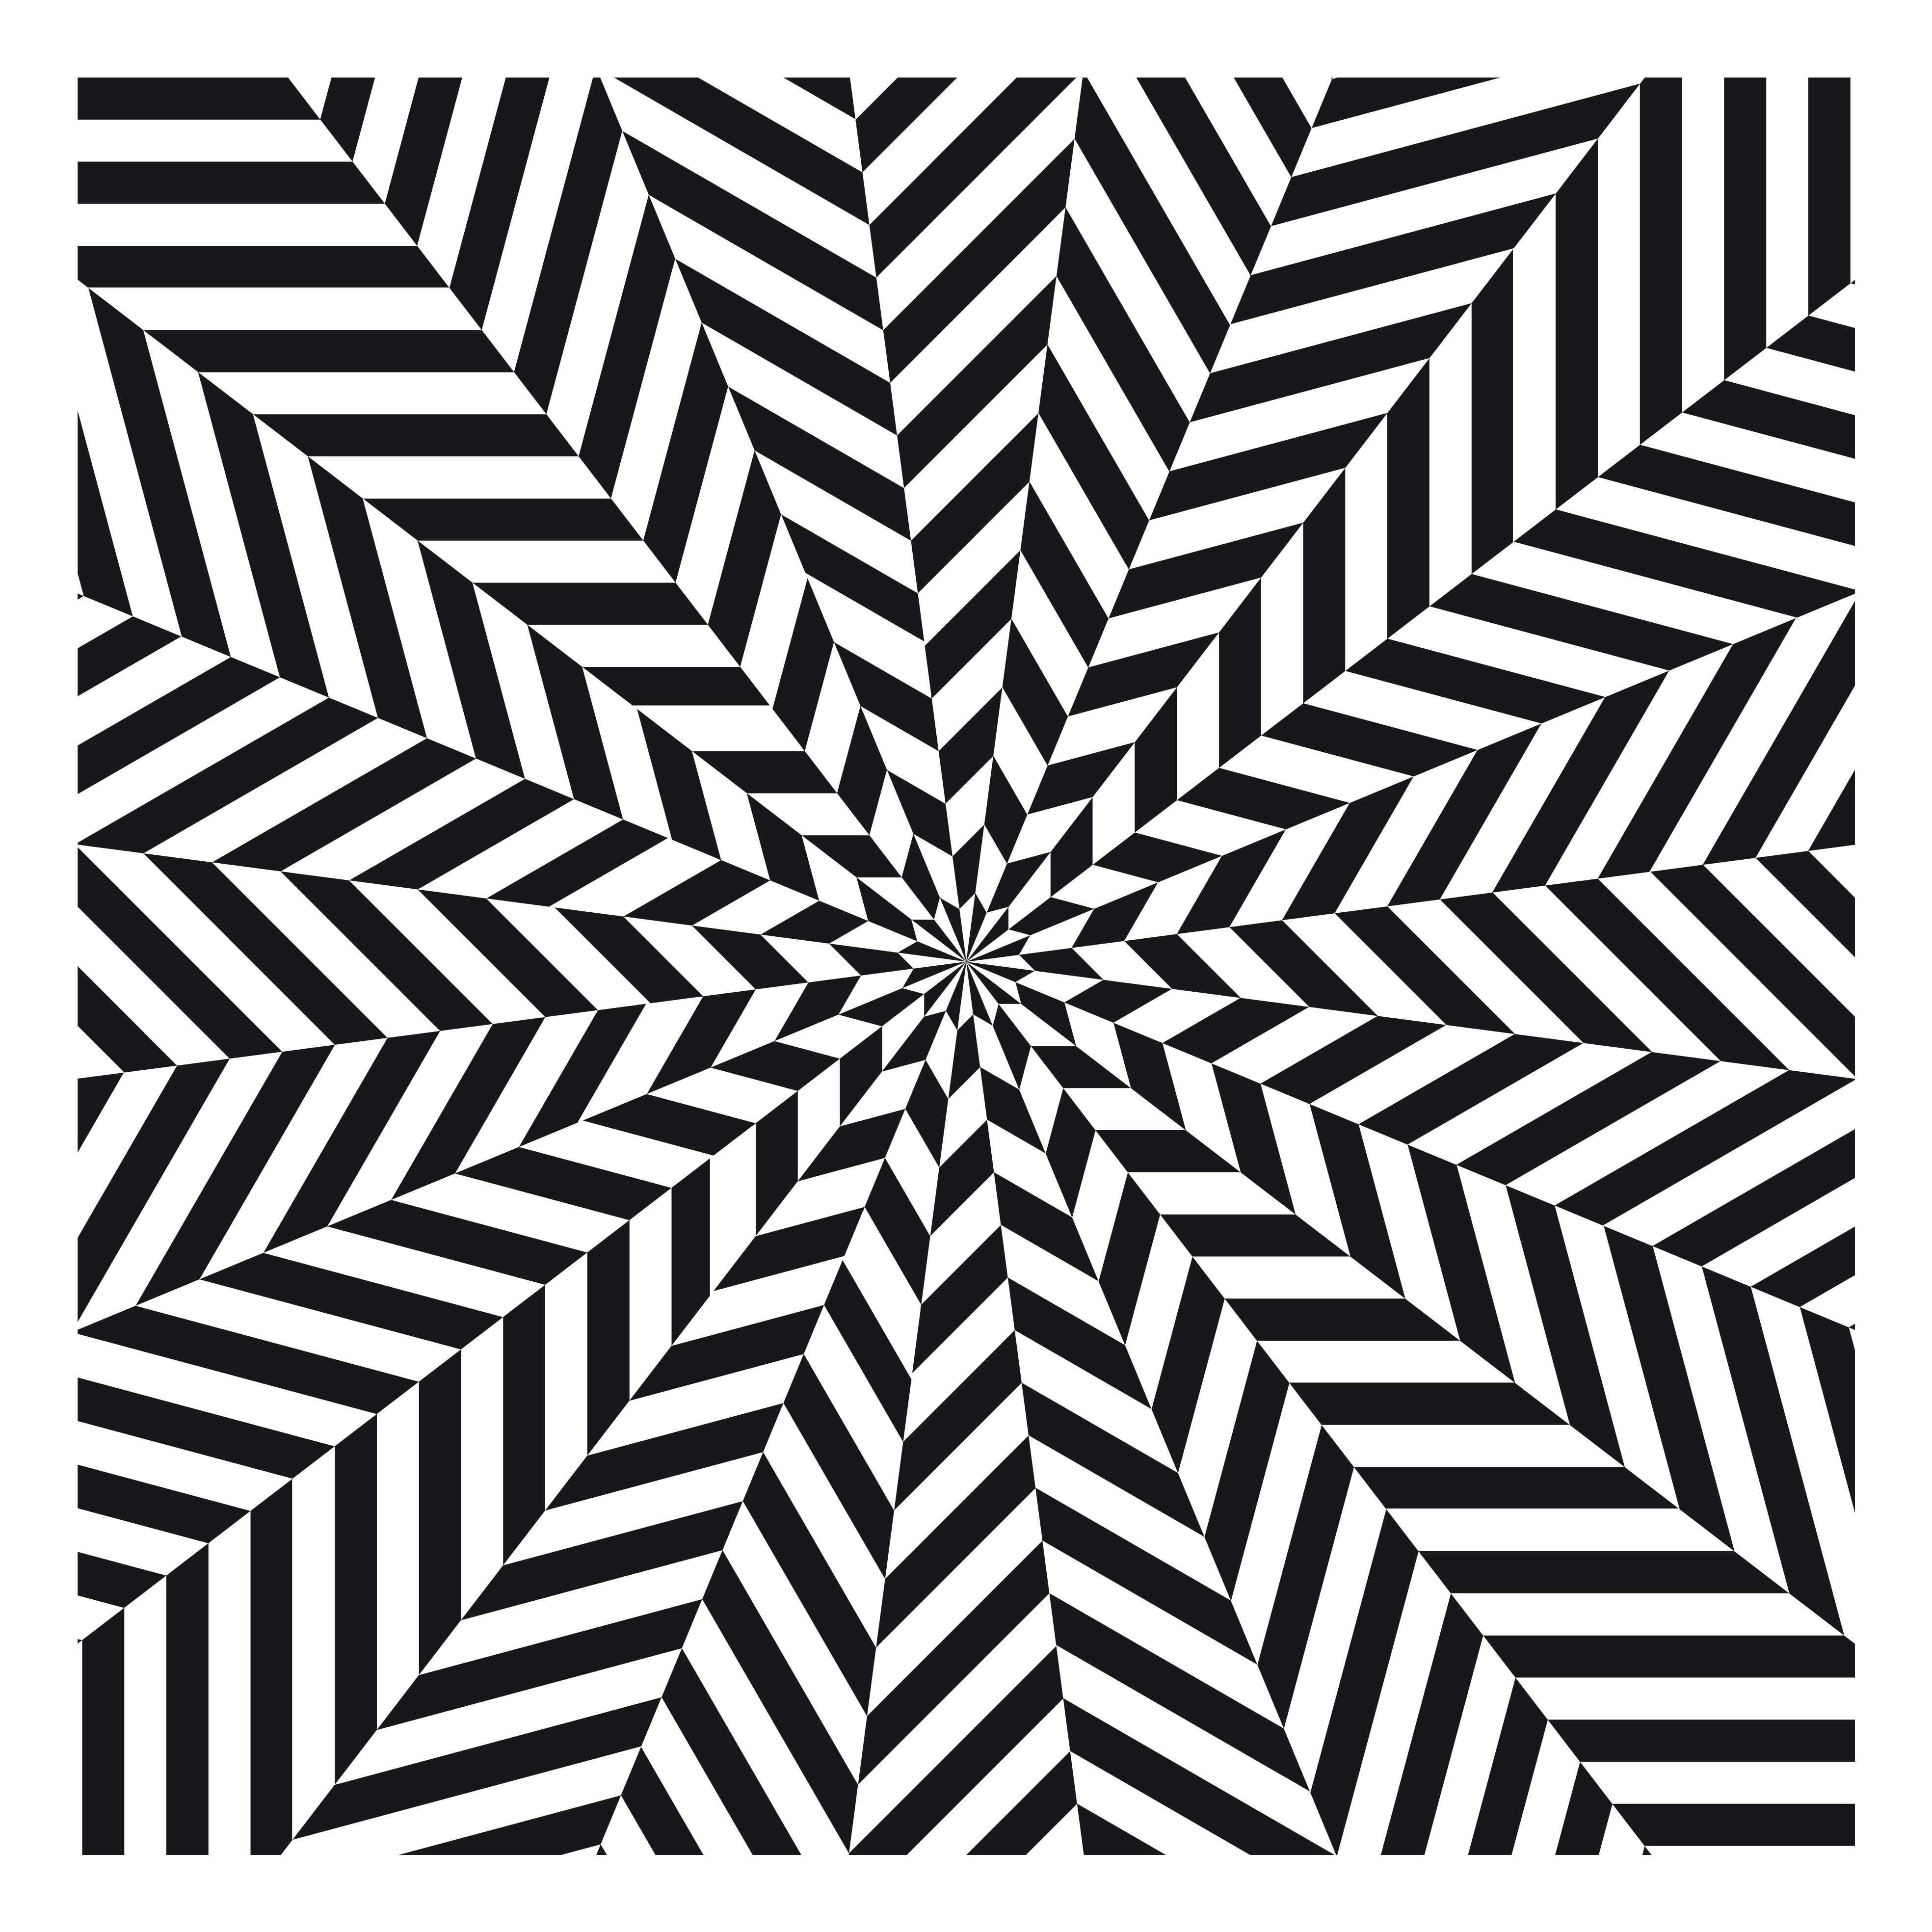 Drawn optical illusion geometric OpticalOptical Illusions Untitled wordpress Pinterest